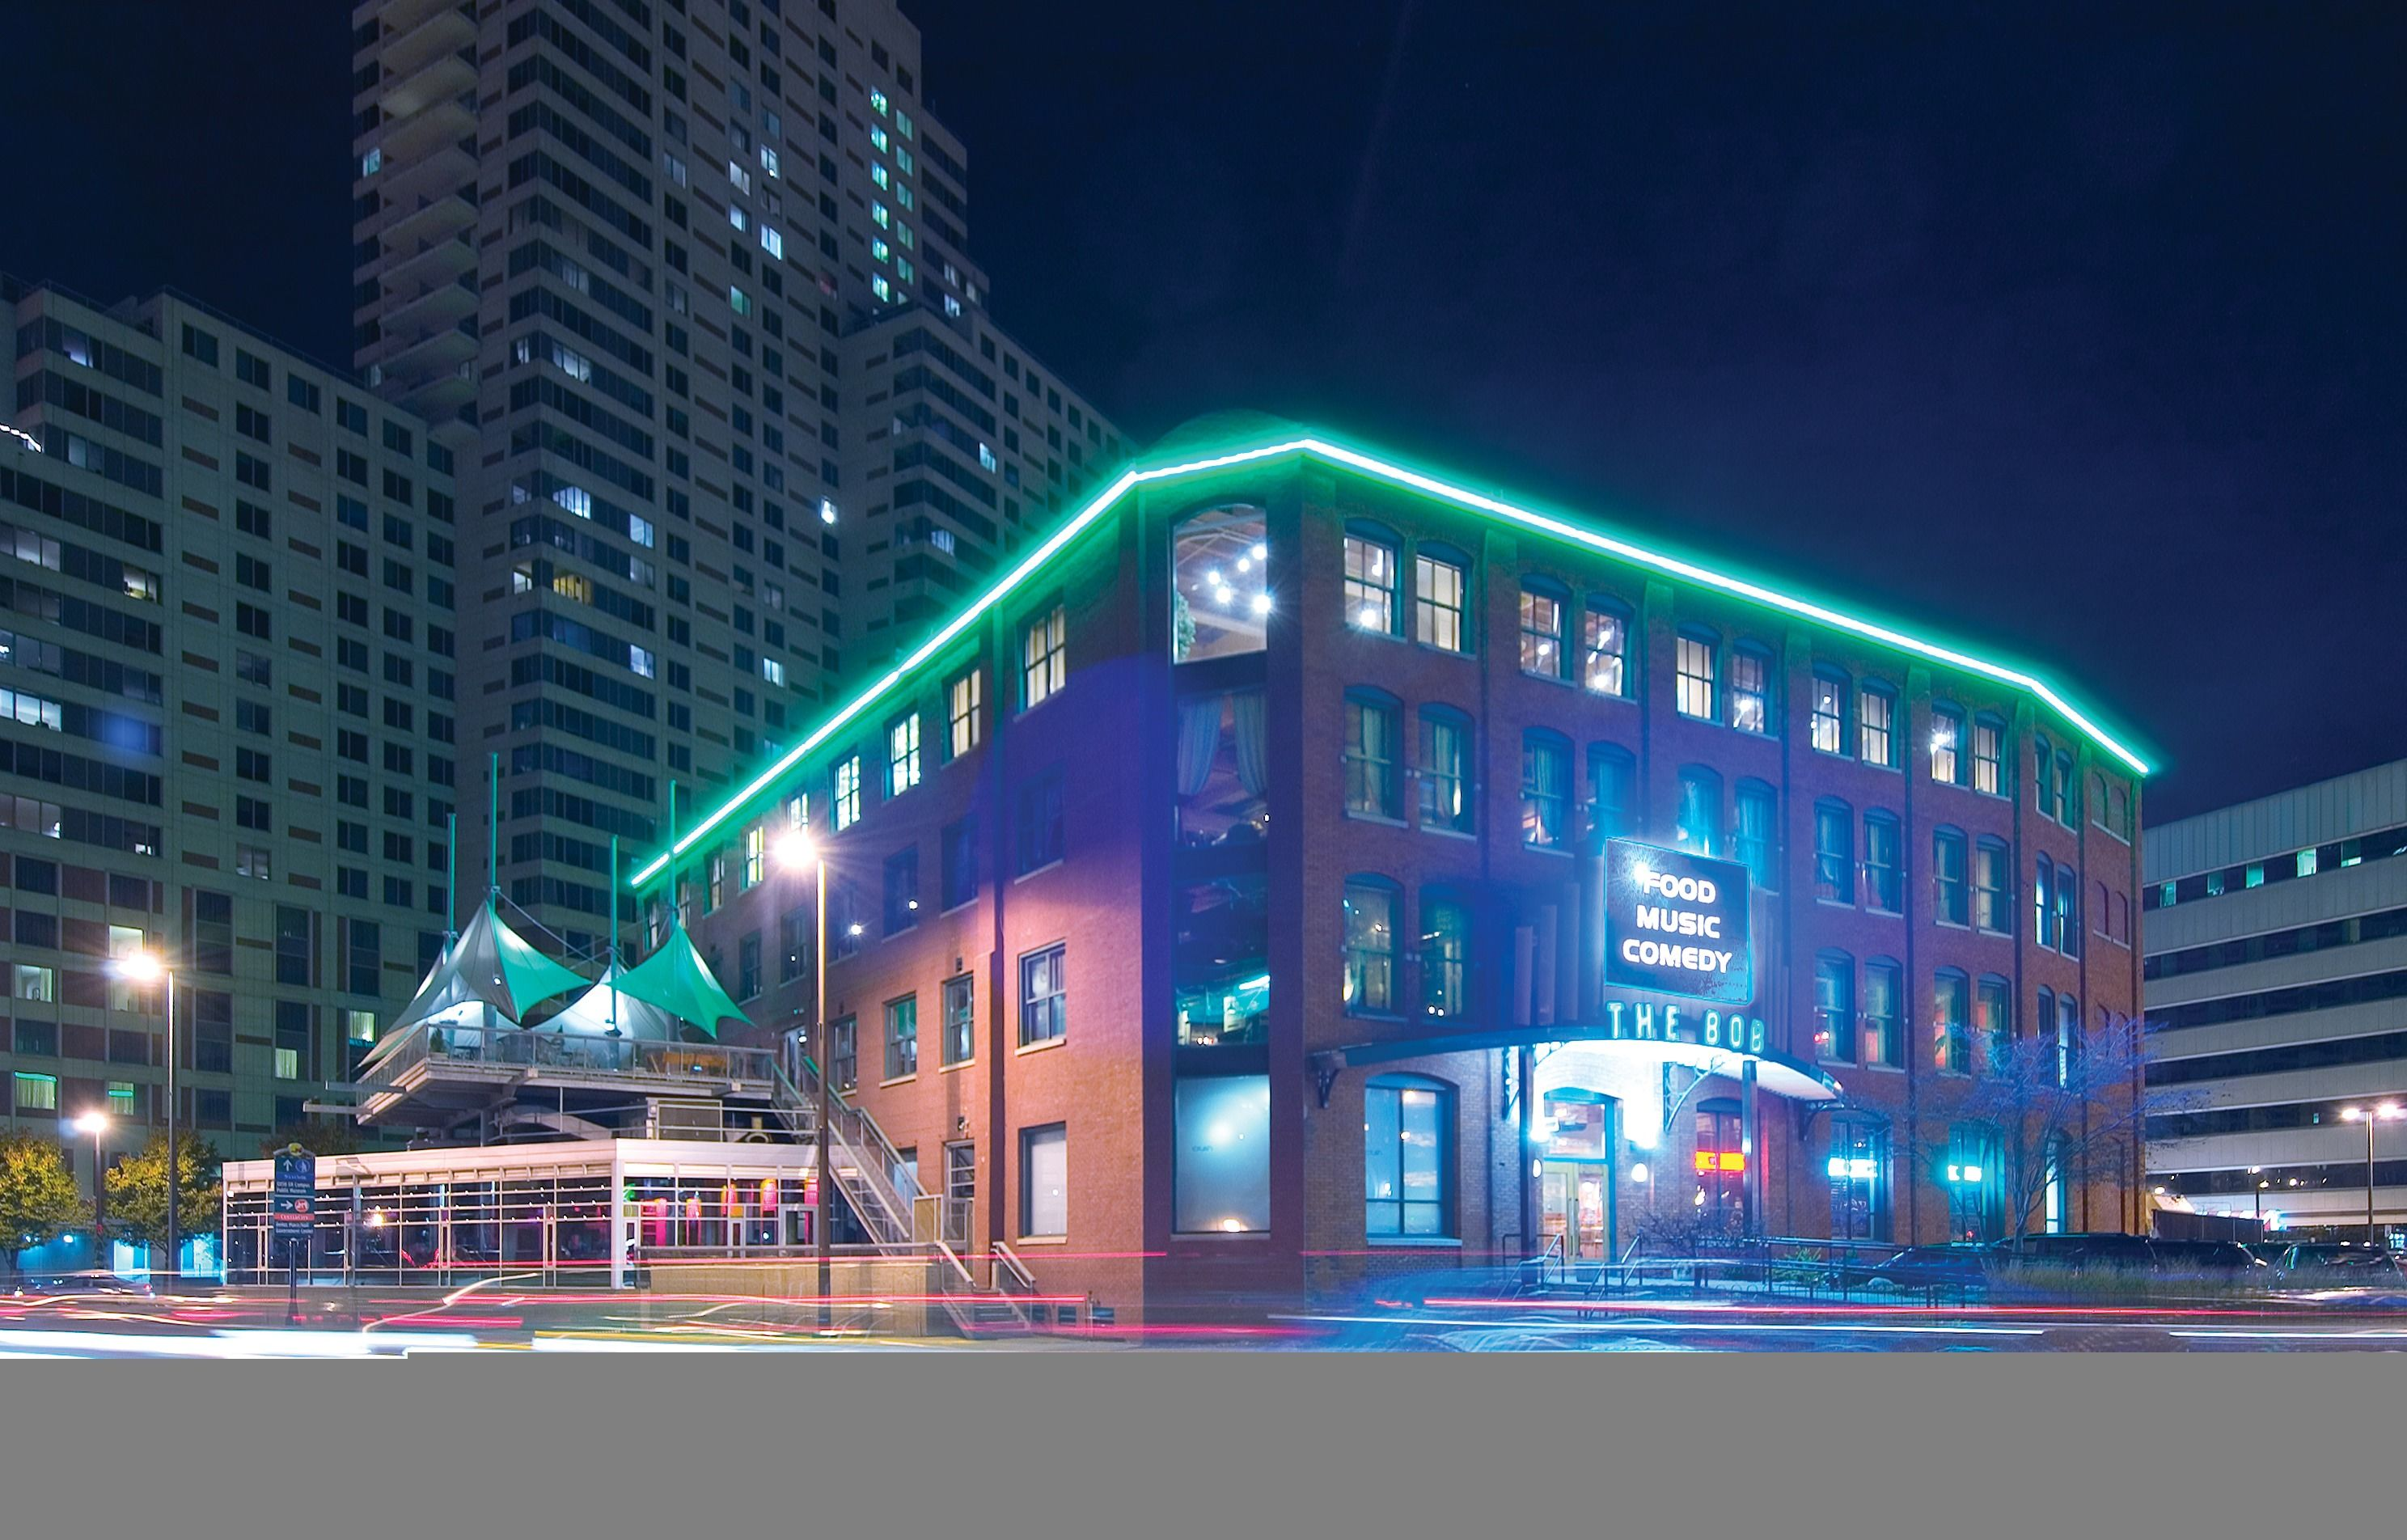 Spotlight The Big Old Building B O B In Grand Rapids Grand Rapids Grand Rapids Michigan Night Life